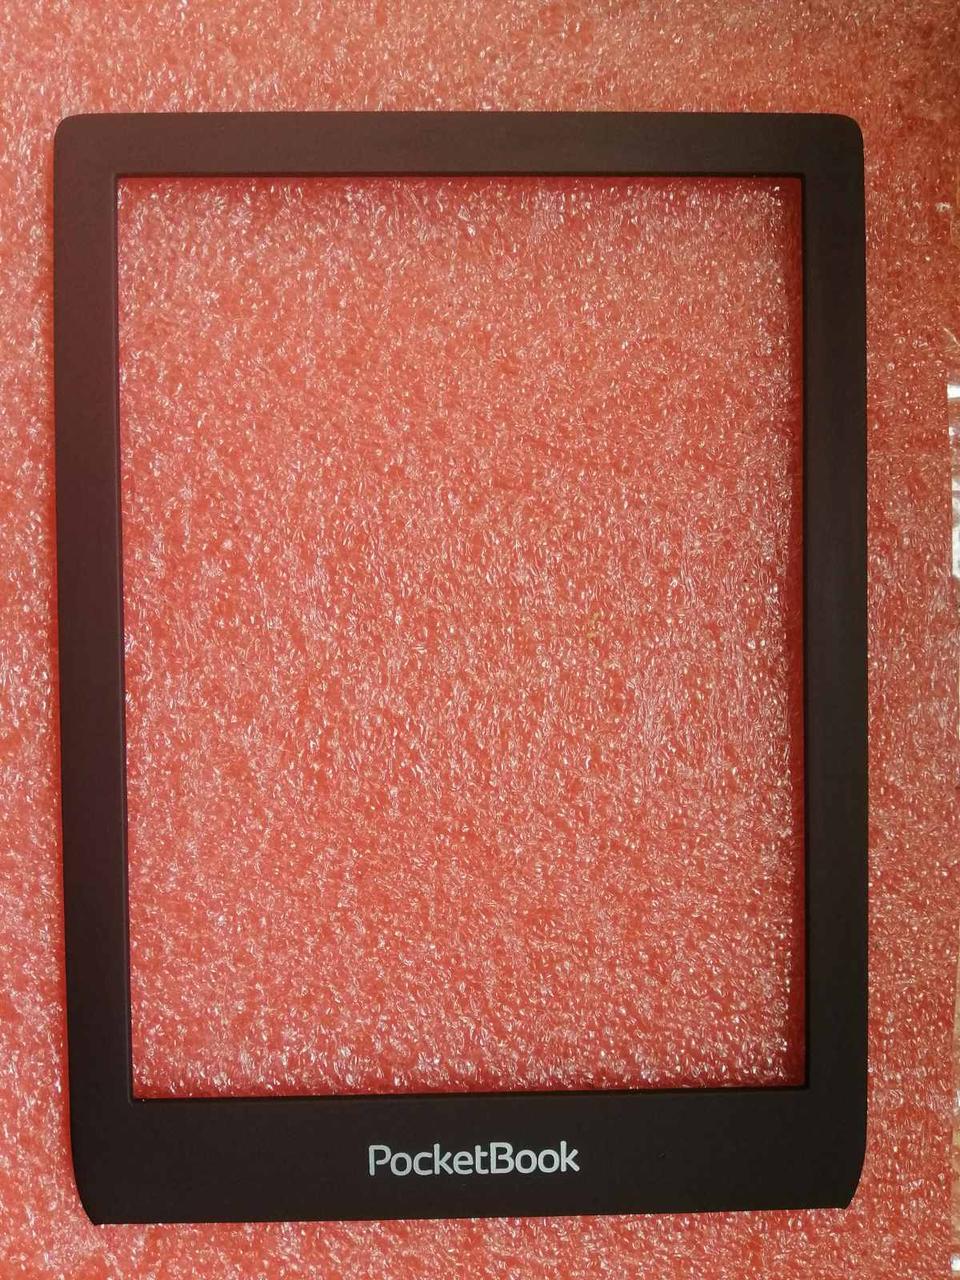 Рамка Pocketbook Touch Lux 4 627 черная